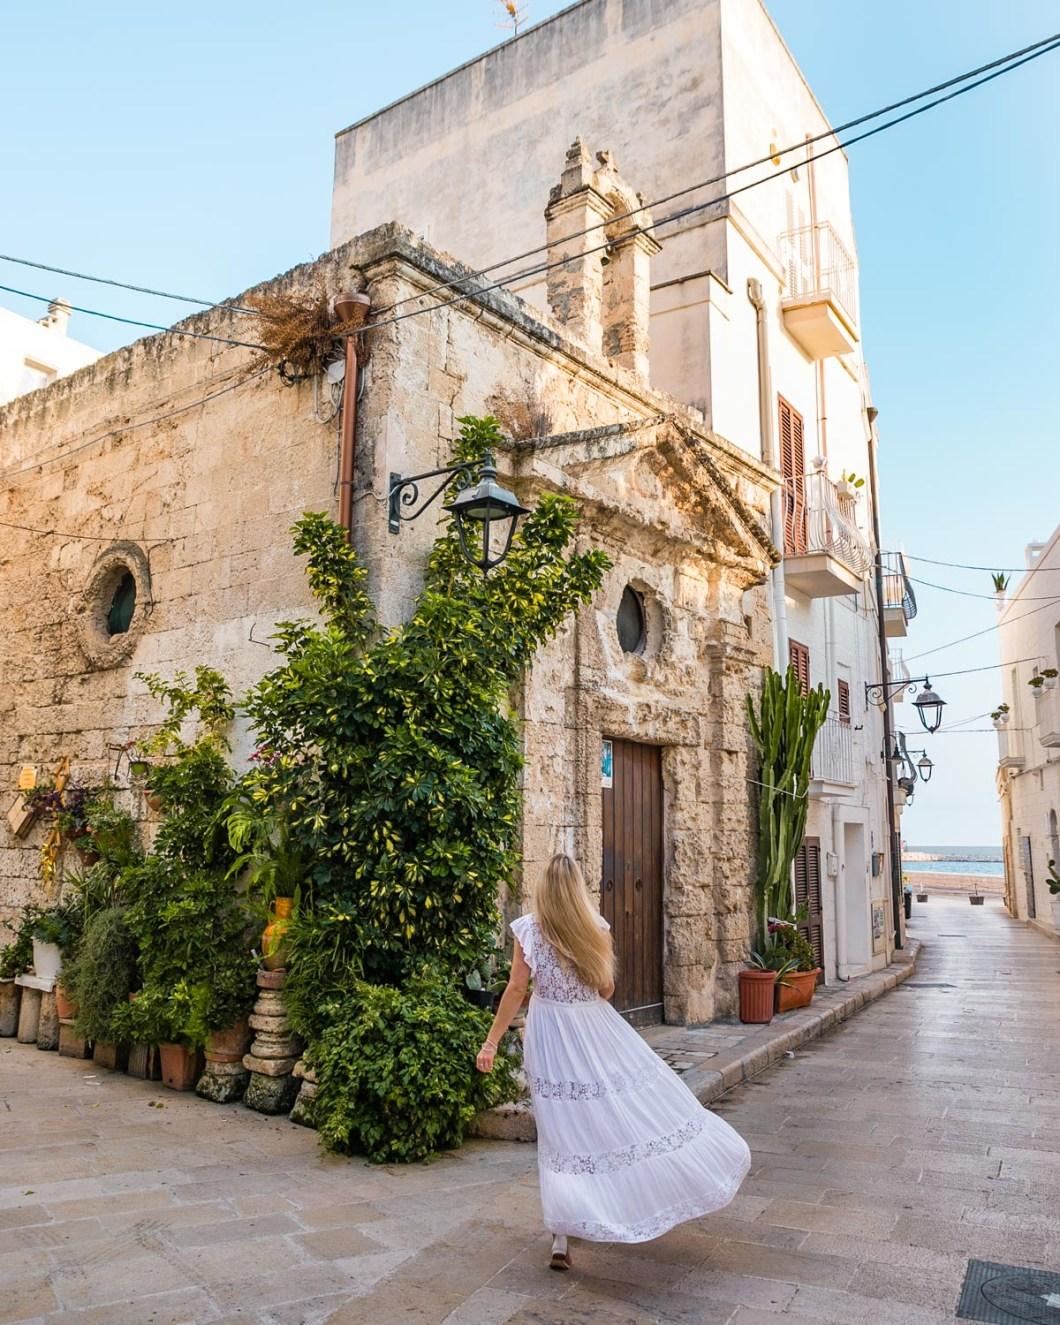 Little Church in Monopoli - Puglia